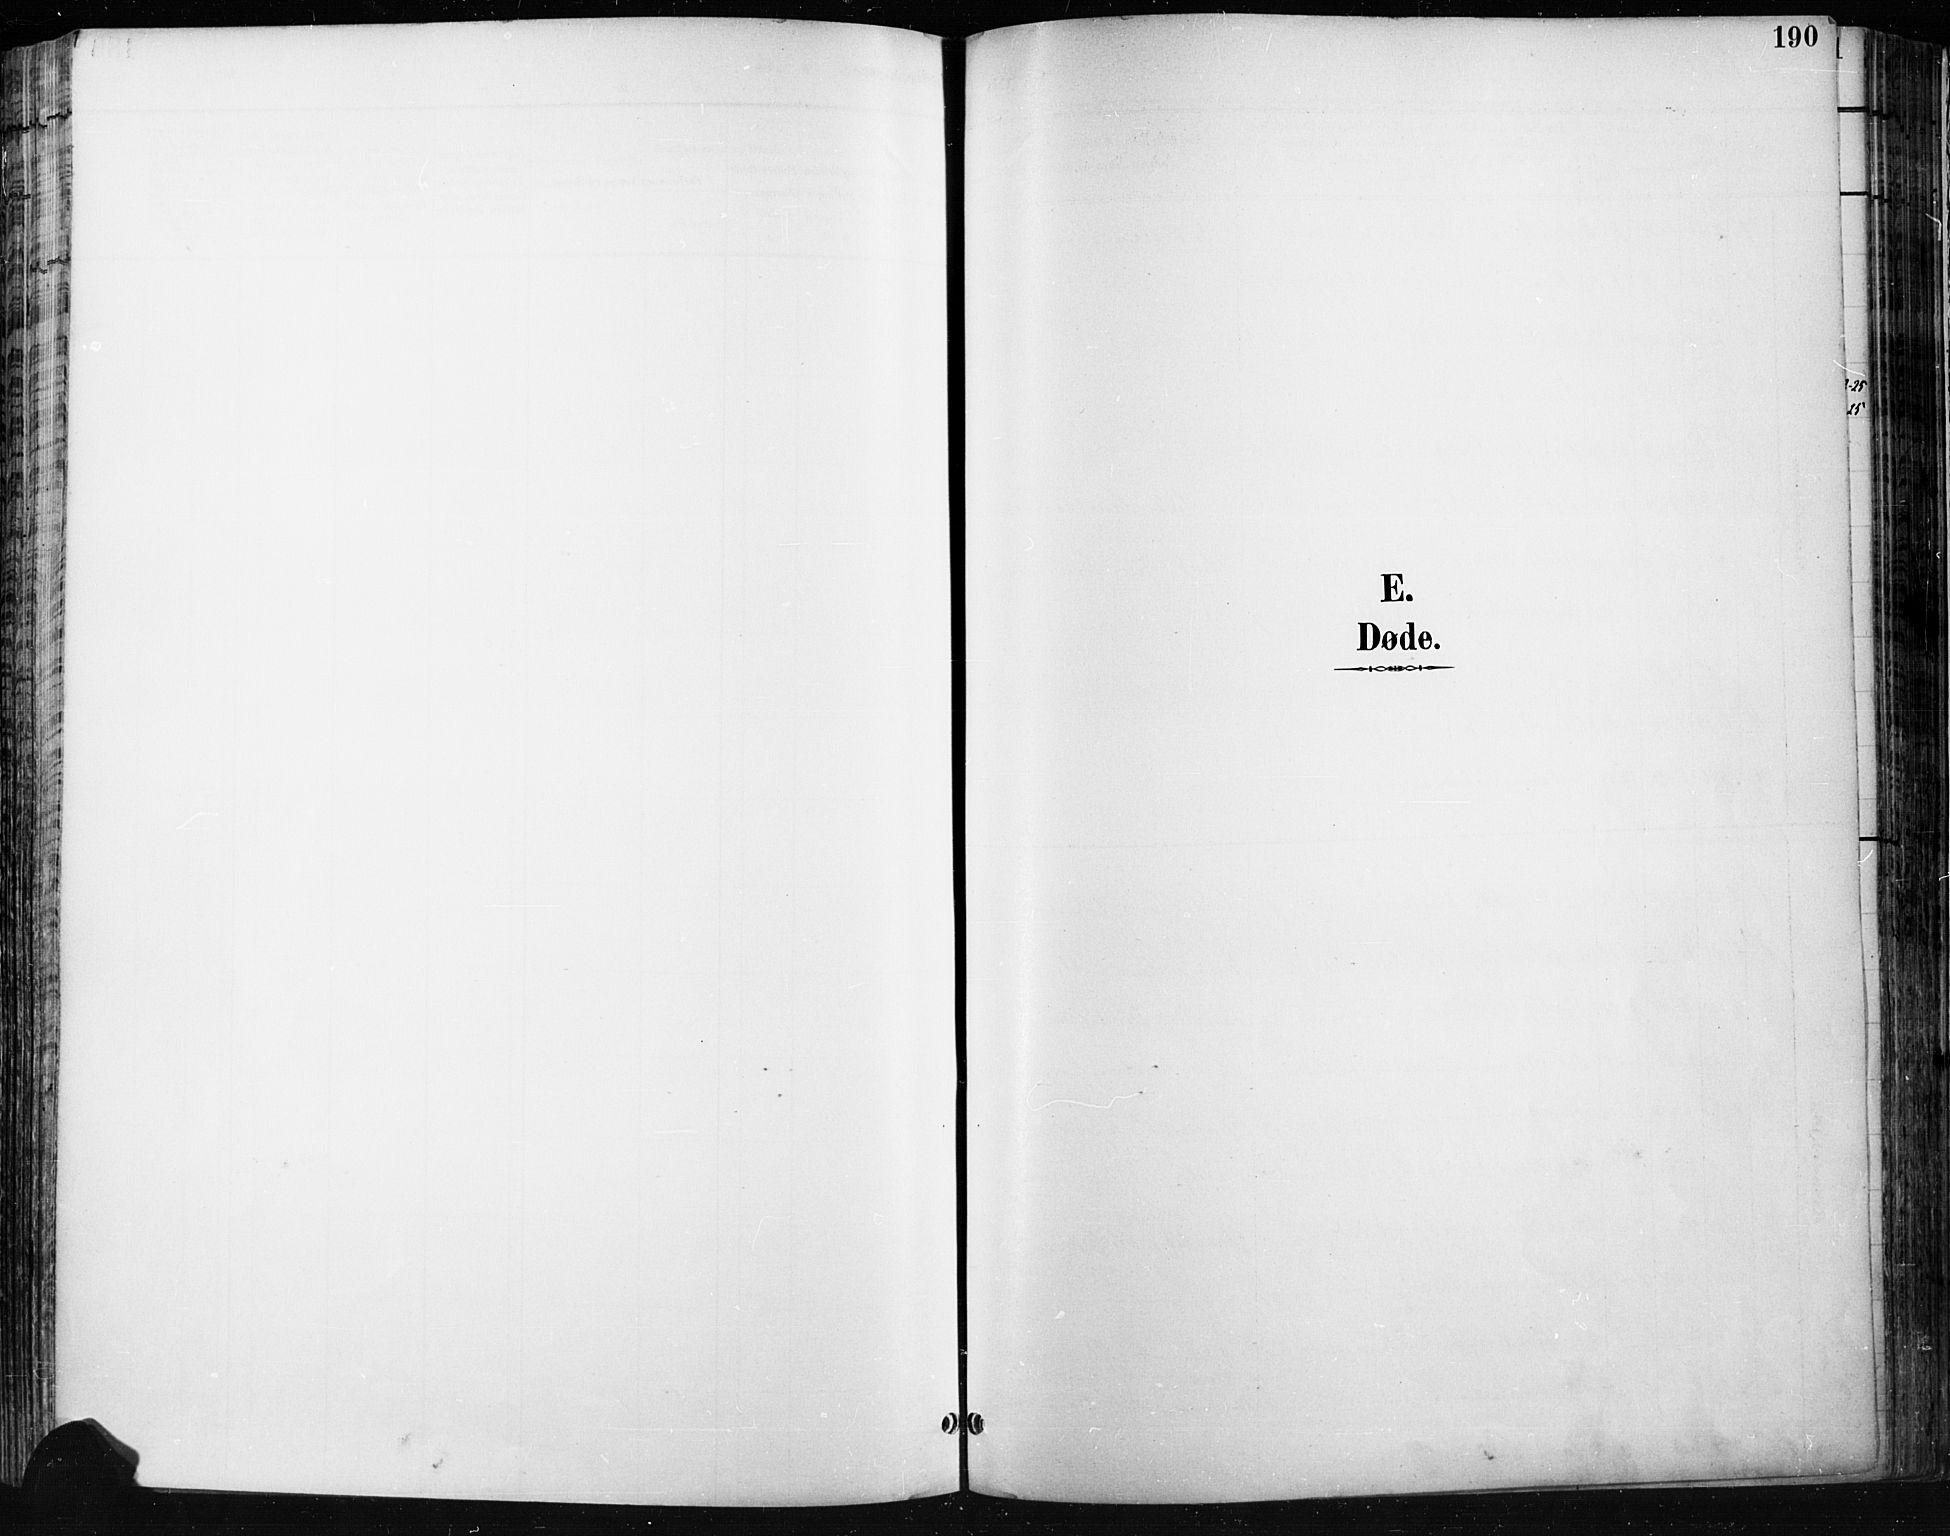 SAH, Jevnaker prestekontor, Ministerialbok nr. 9, 1891-1901, s. 190